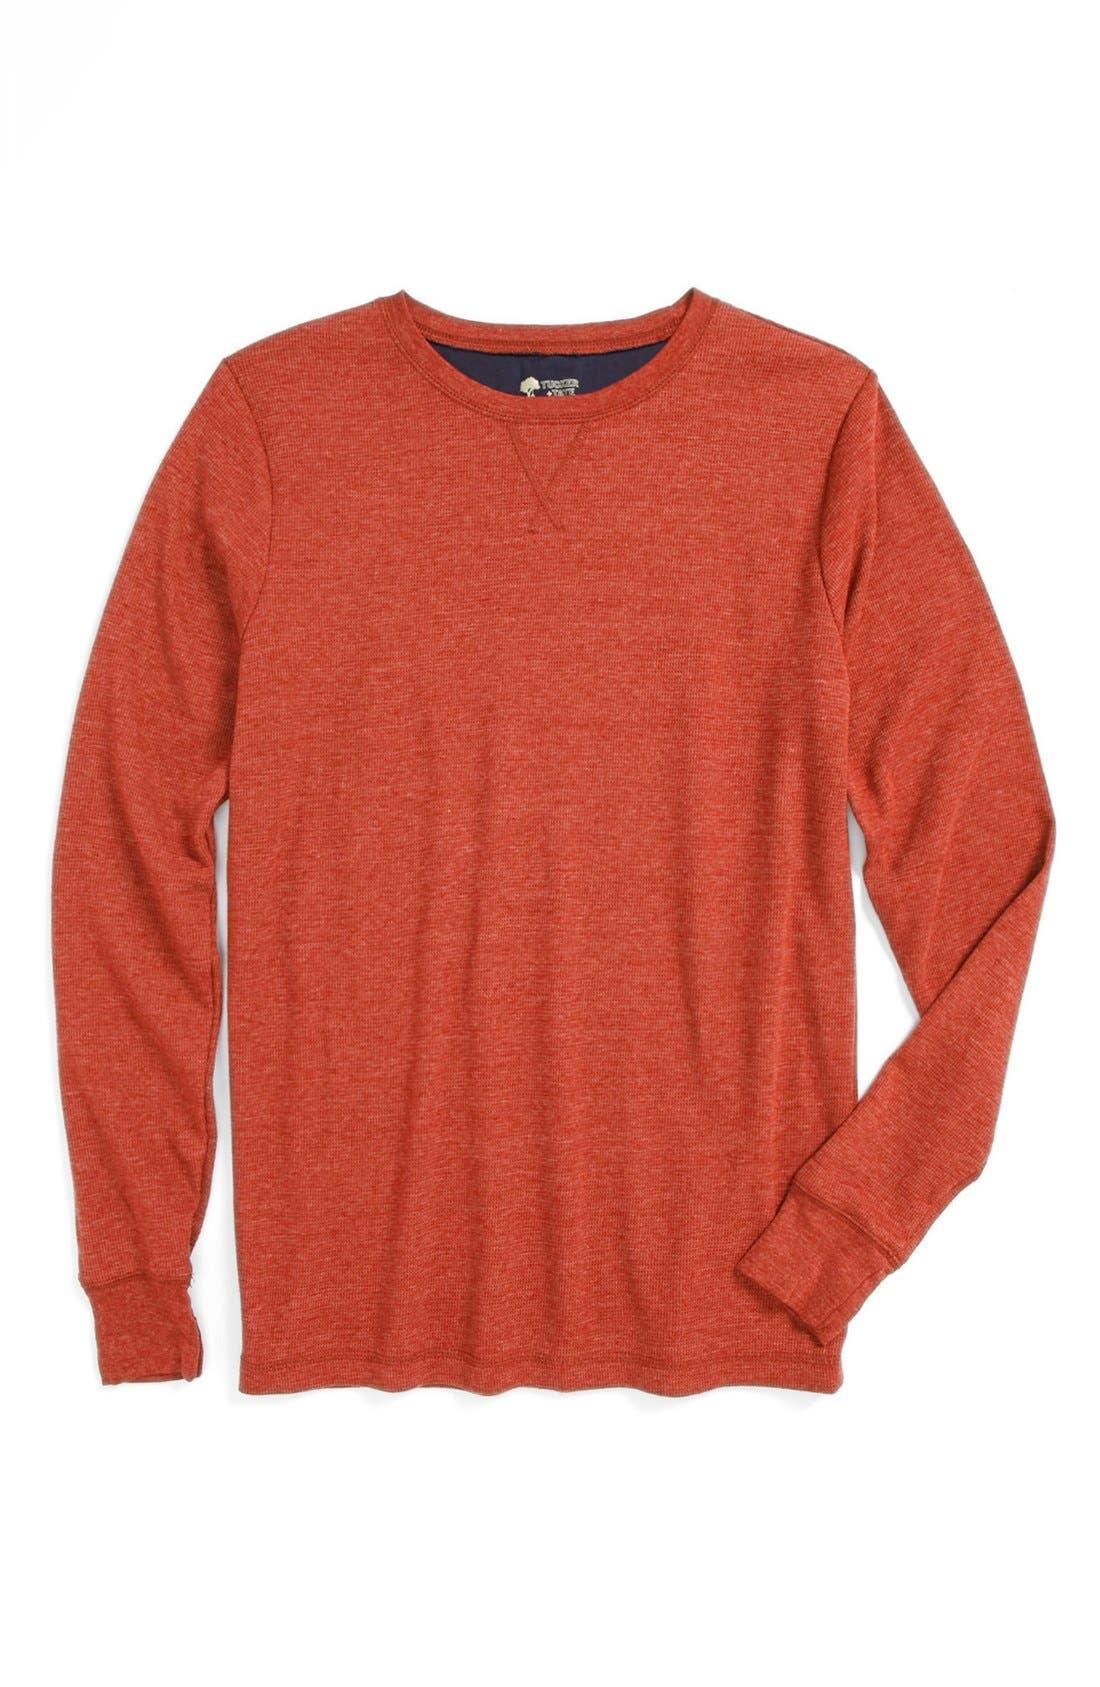 Alternate Image 1 Selected - Tucker + Tate 'Sultan' Long Sleeve Thermal T-Shirt (Little Boys)